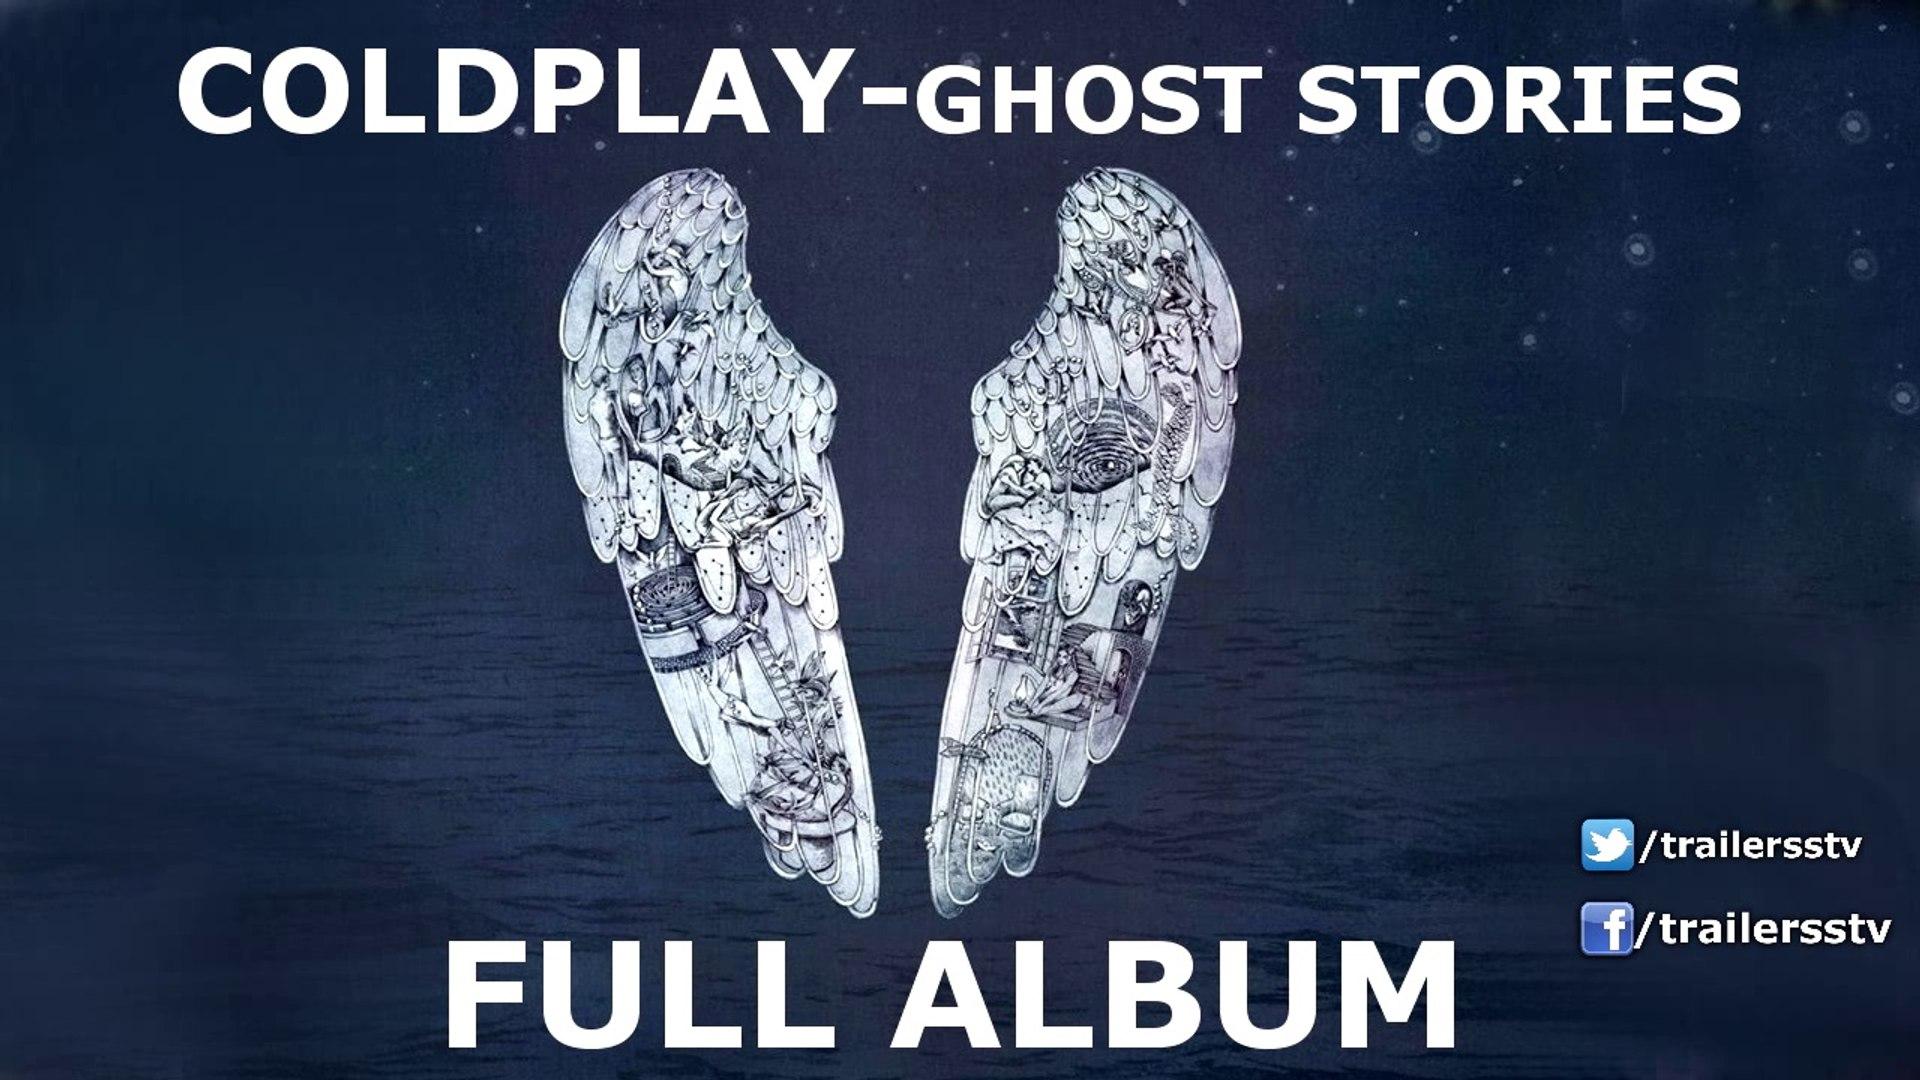 Ghost Stories-FULL ALBUM [Coldplay] 720HD